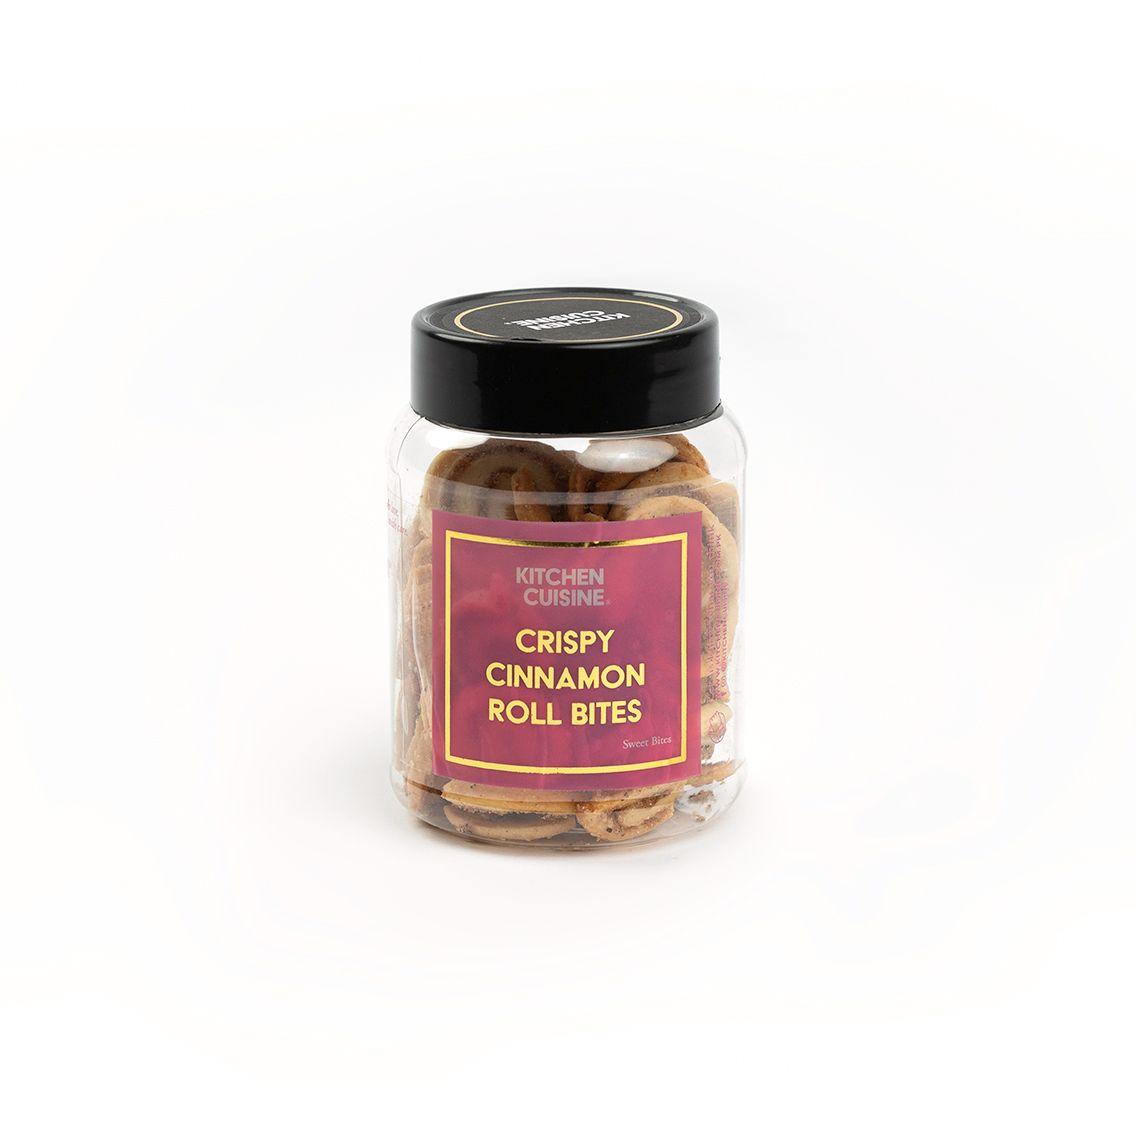 Kitchen Cuisine Default Category Crispy Cinnamon Roll Bites